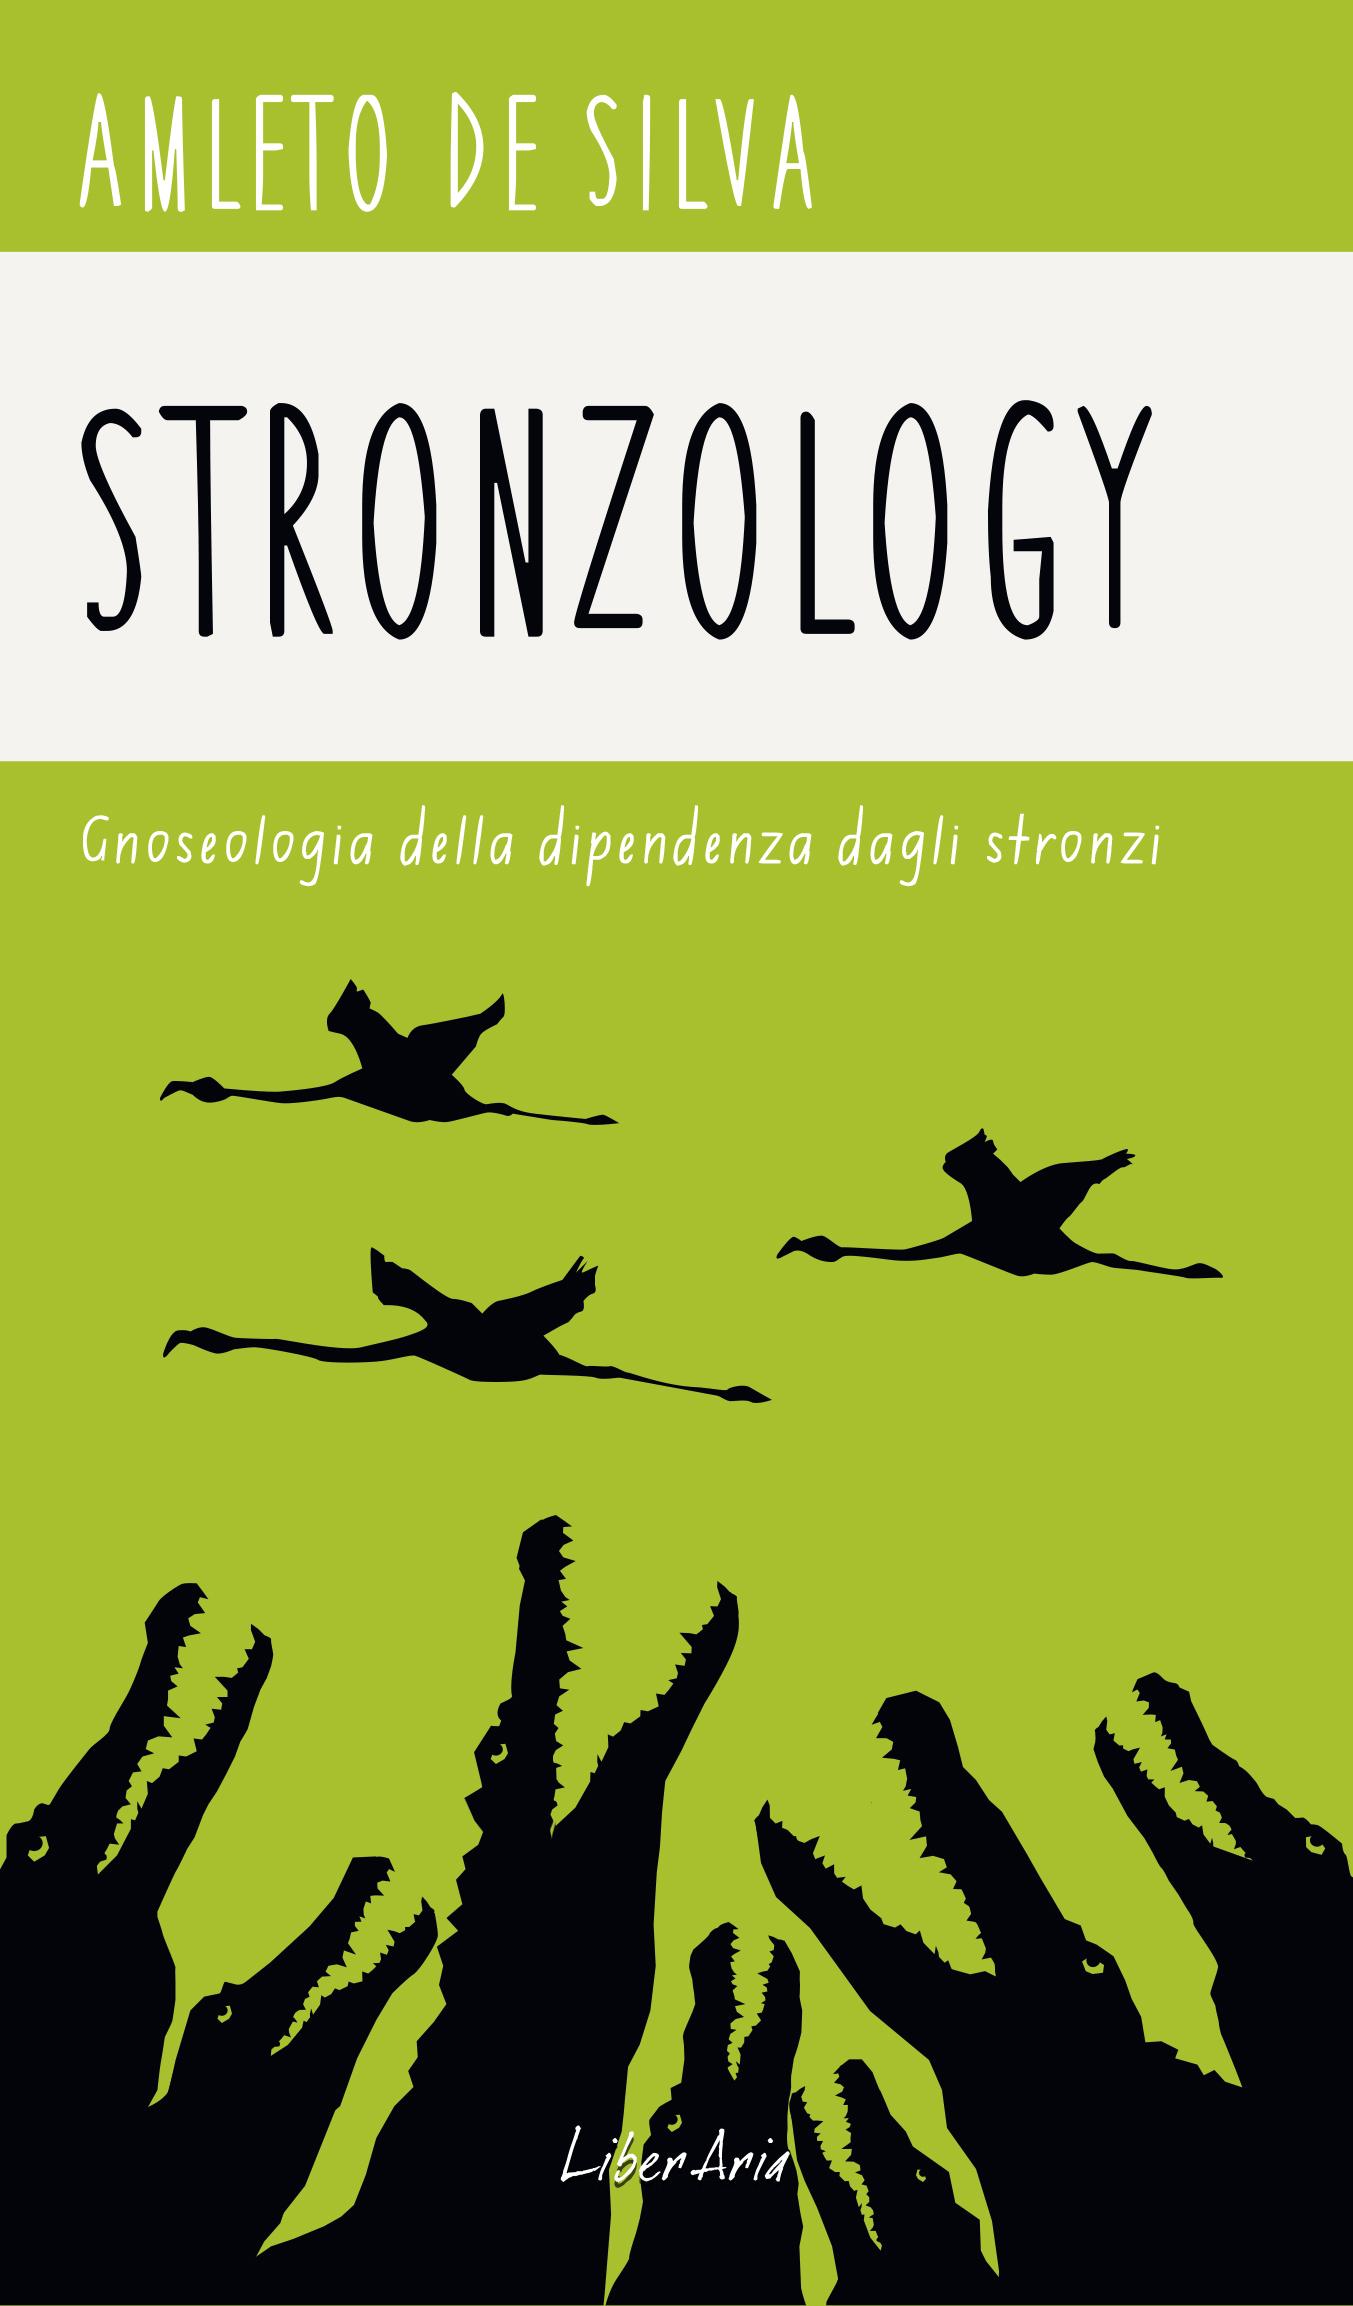 Stronzology